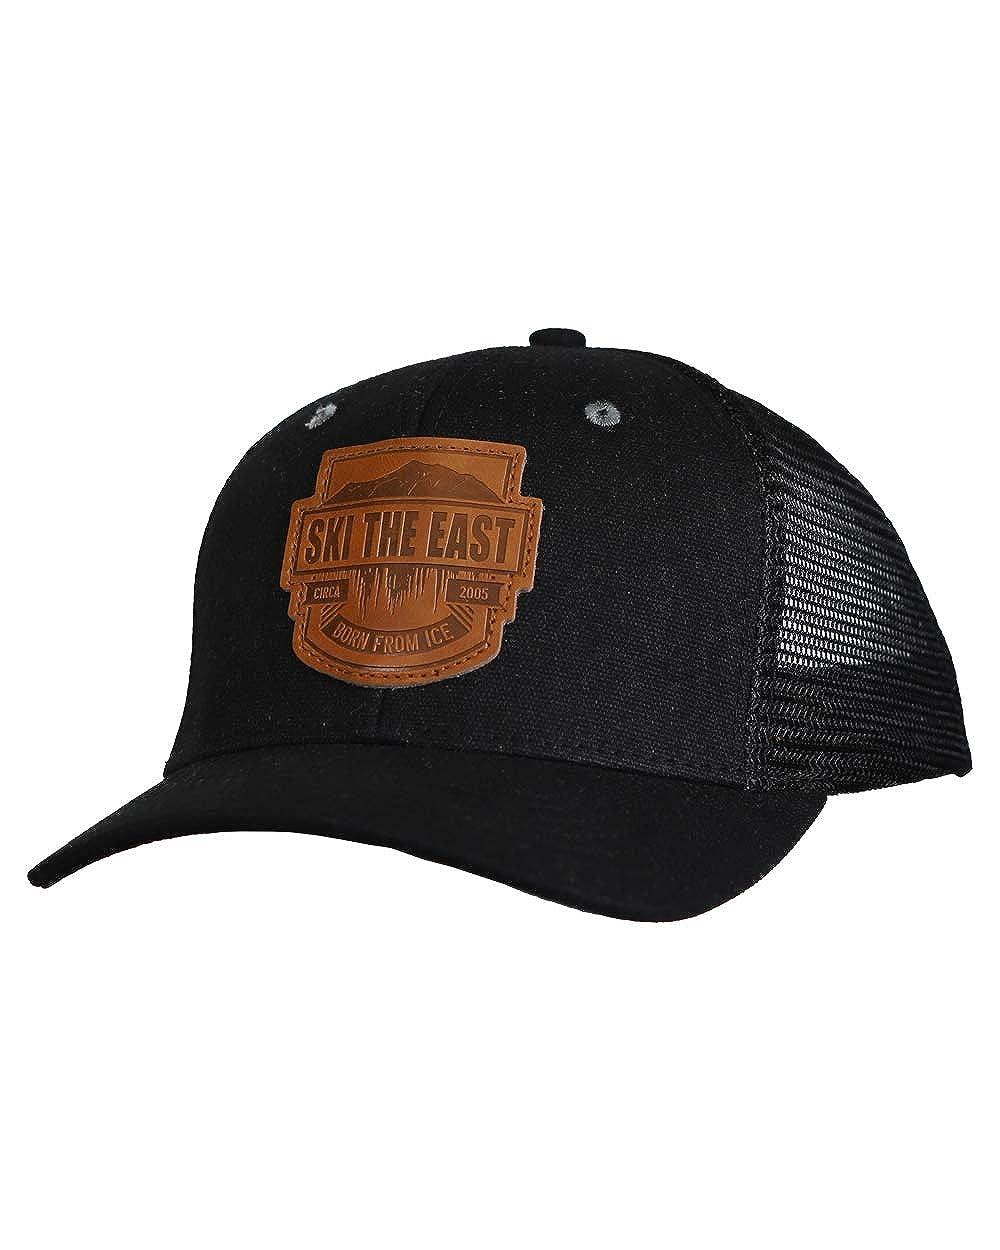 Born from Ice Canvas Trucker Hat Black